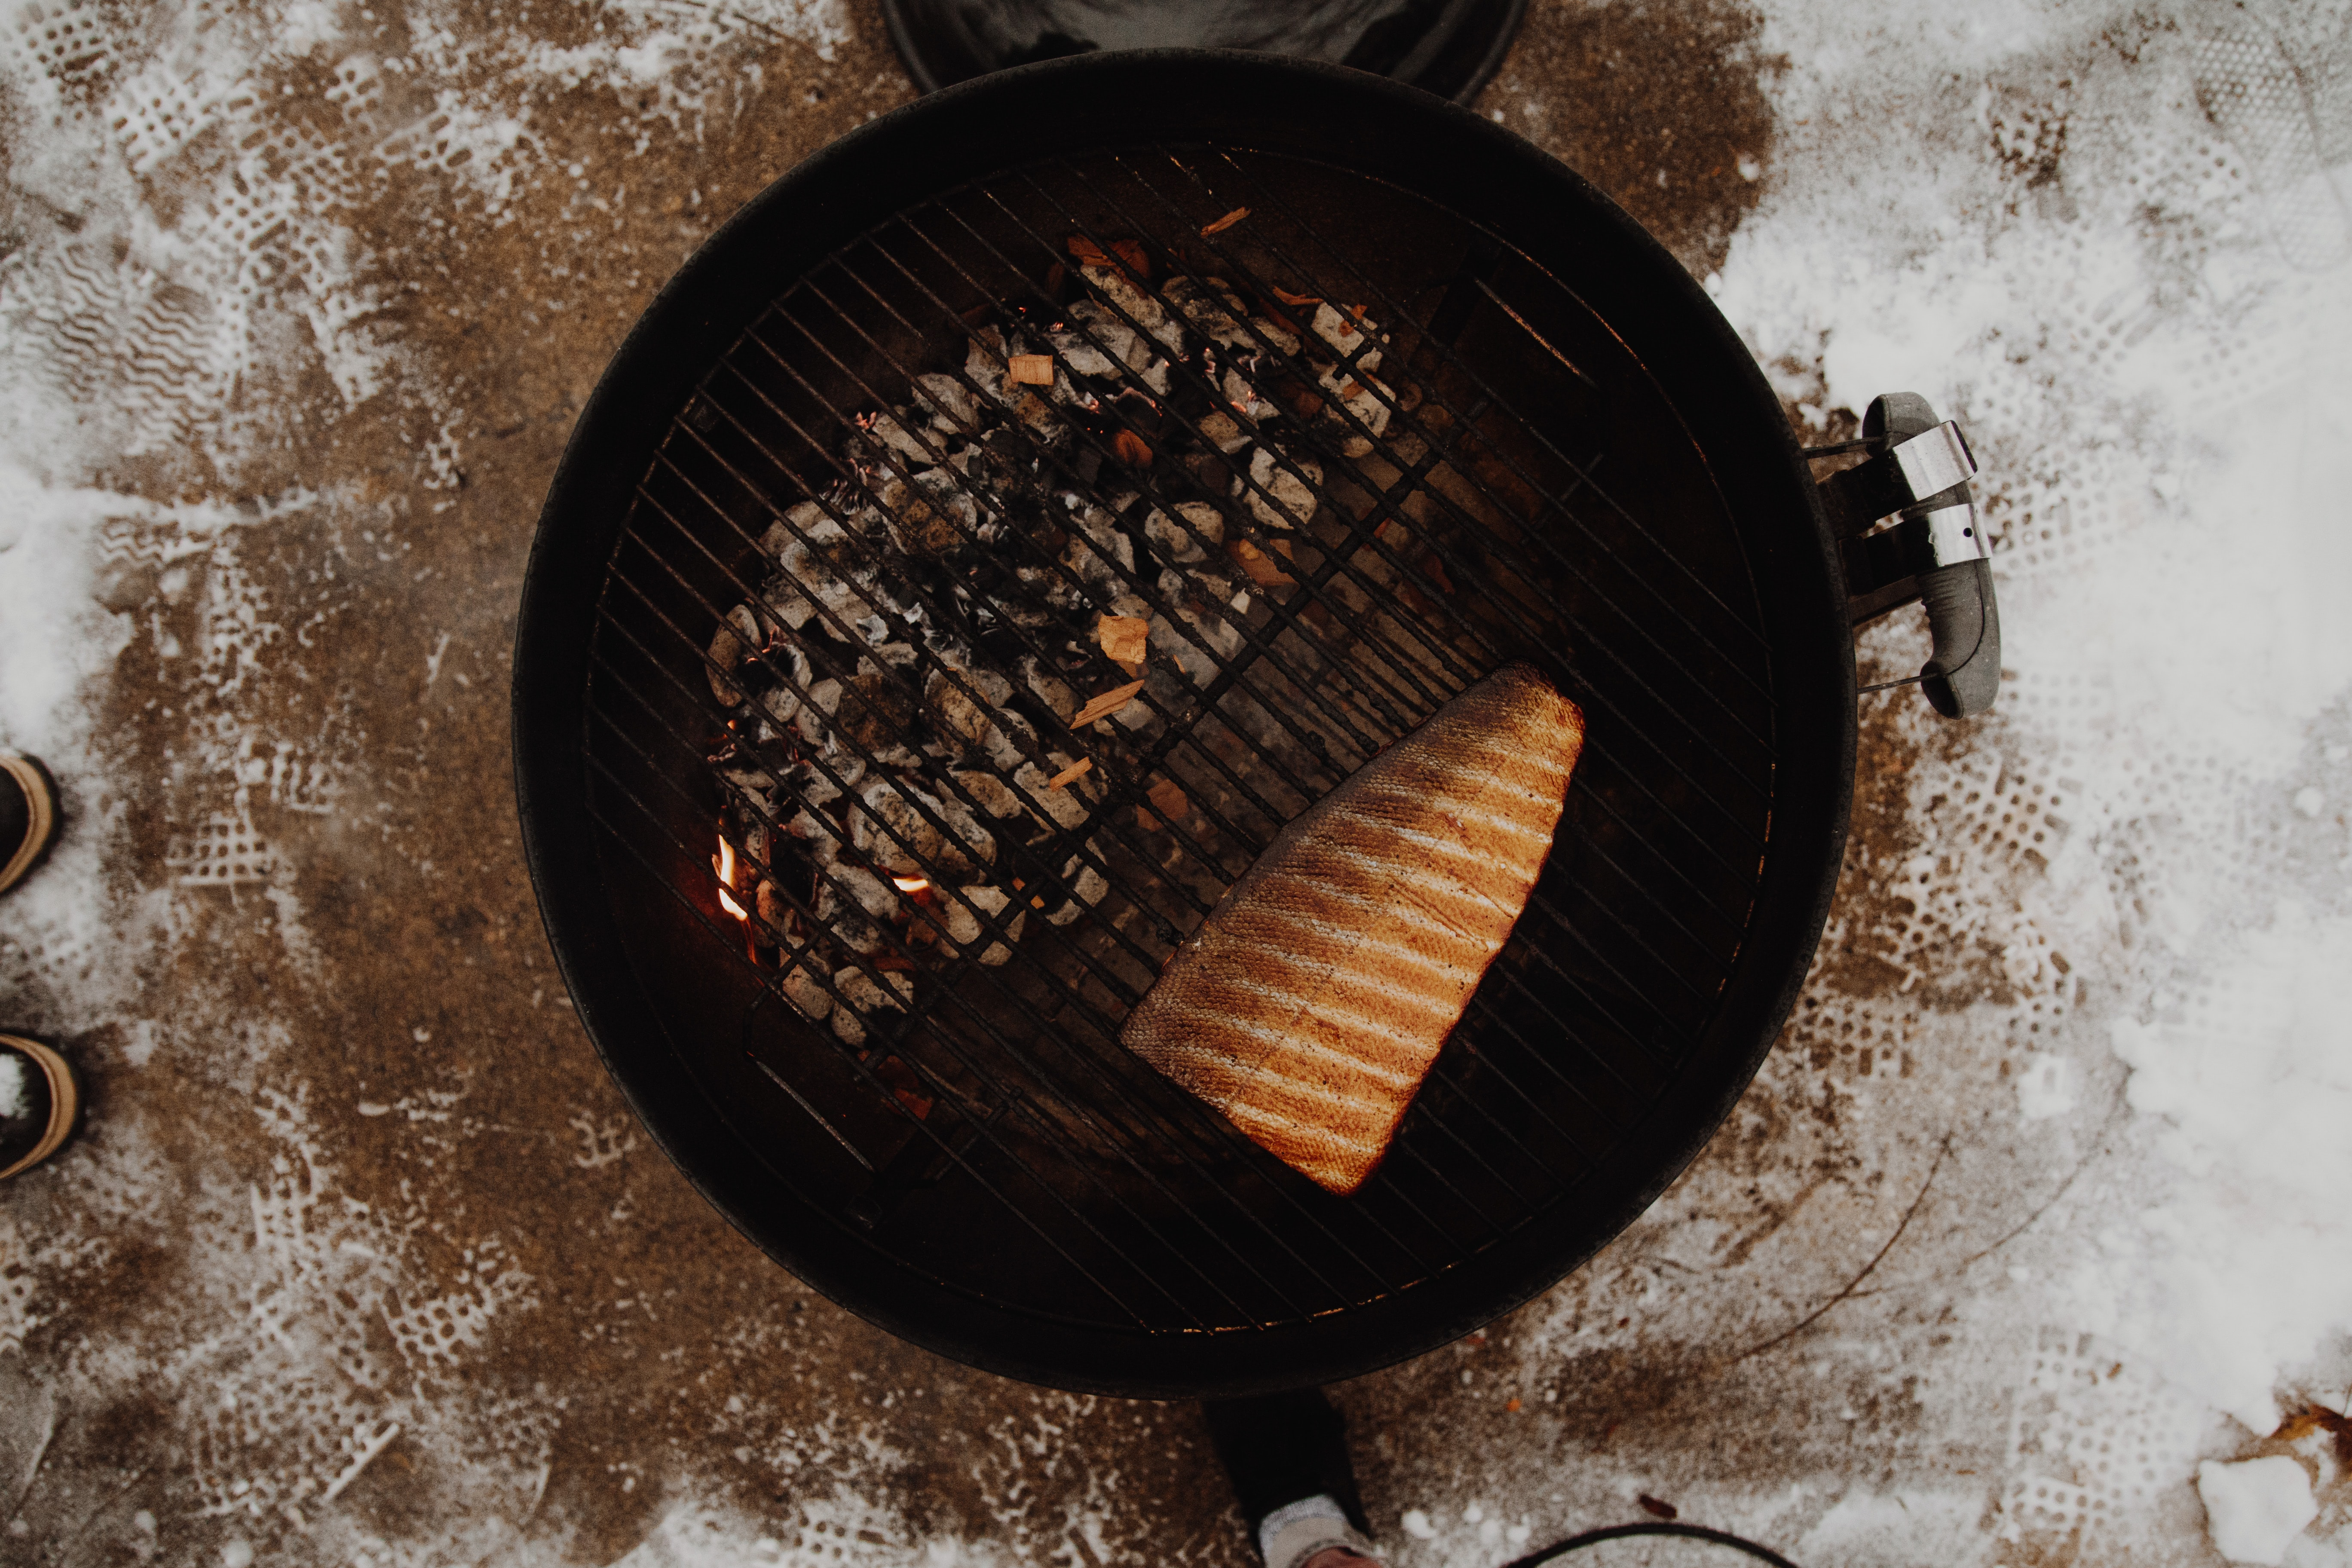 grilled meat on griller